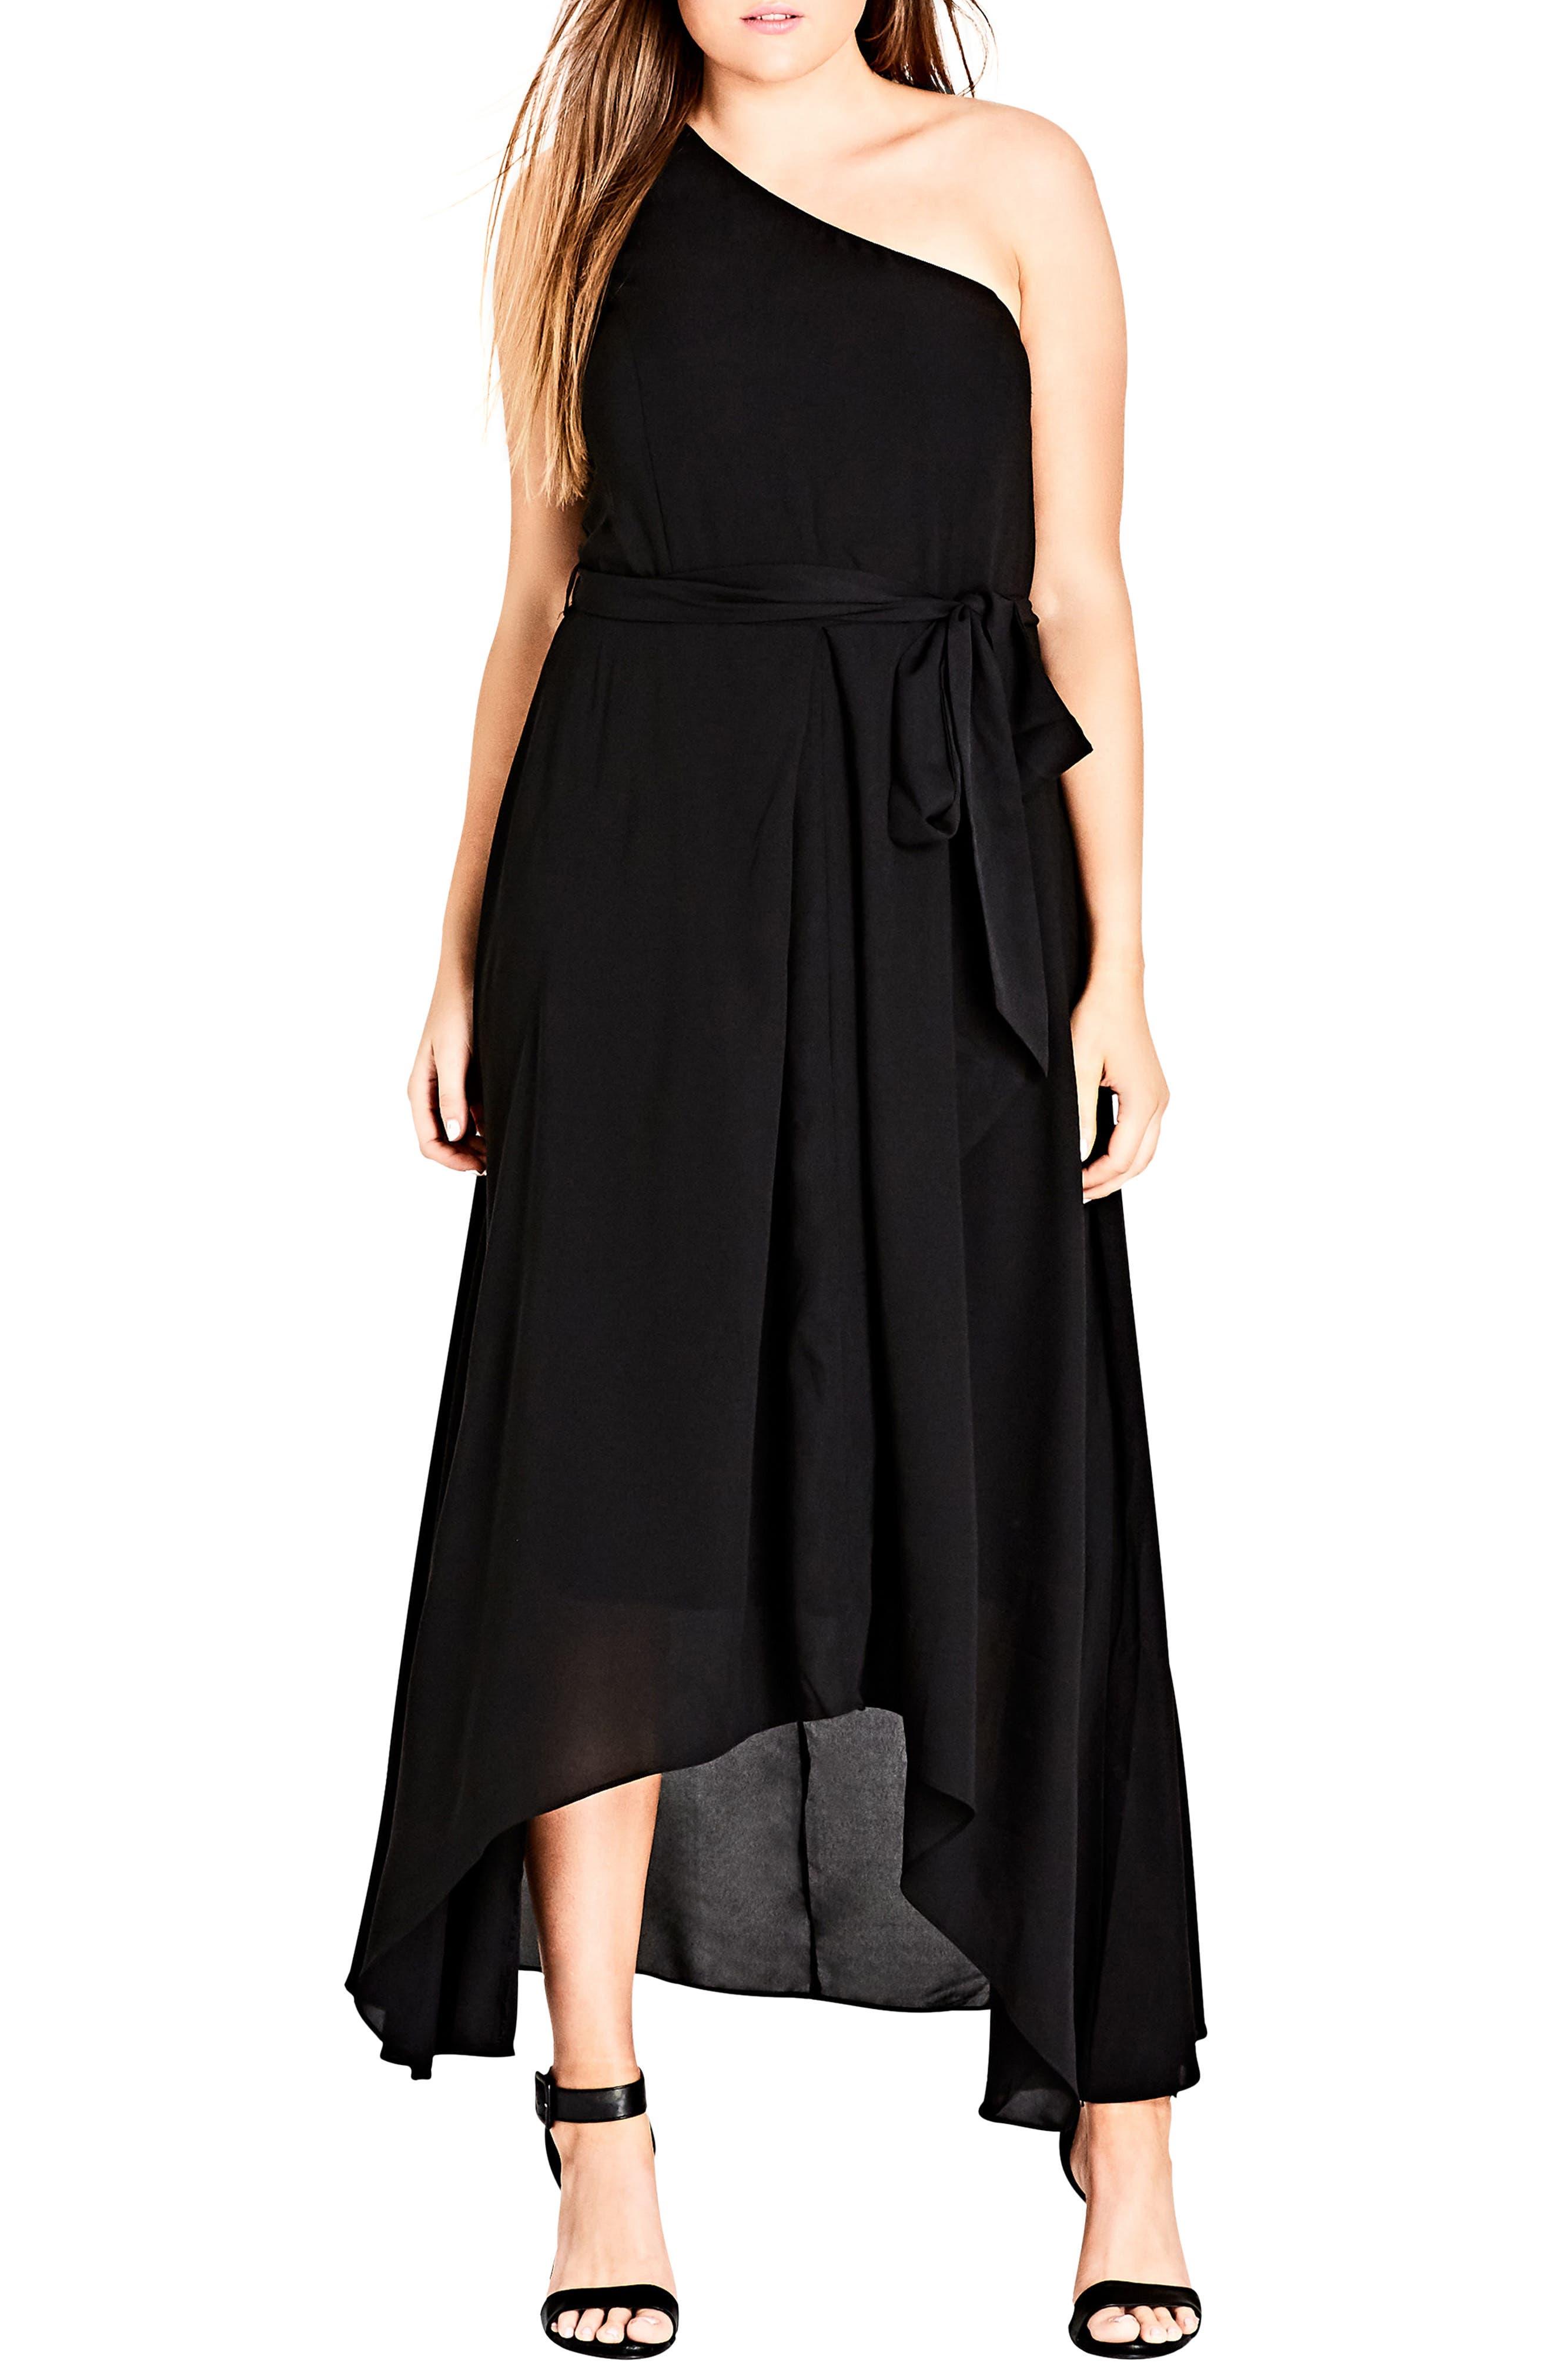 One Love Maxi Dress,                         Main,                         color, Black